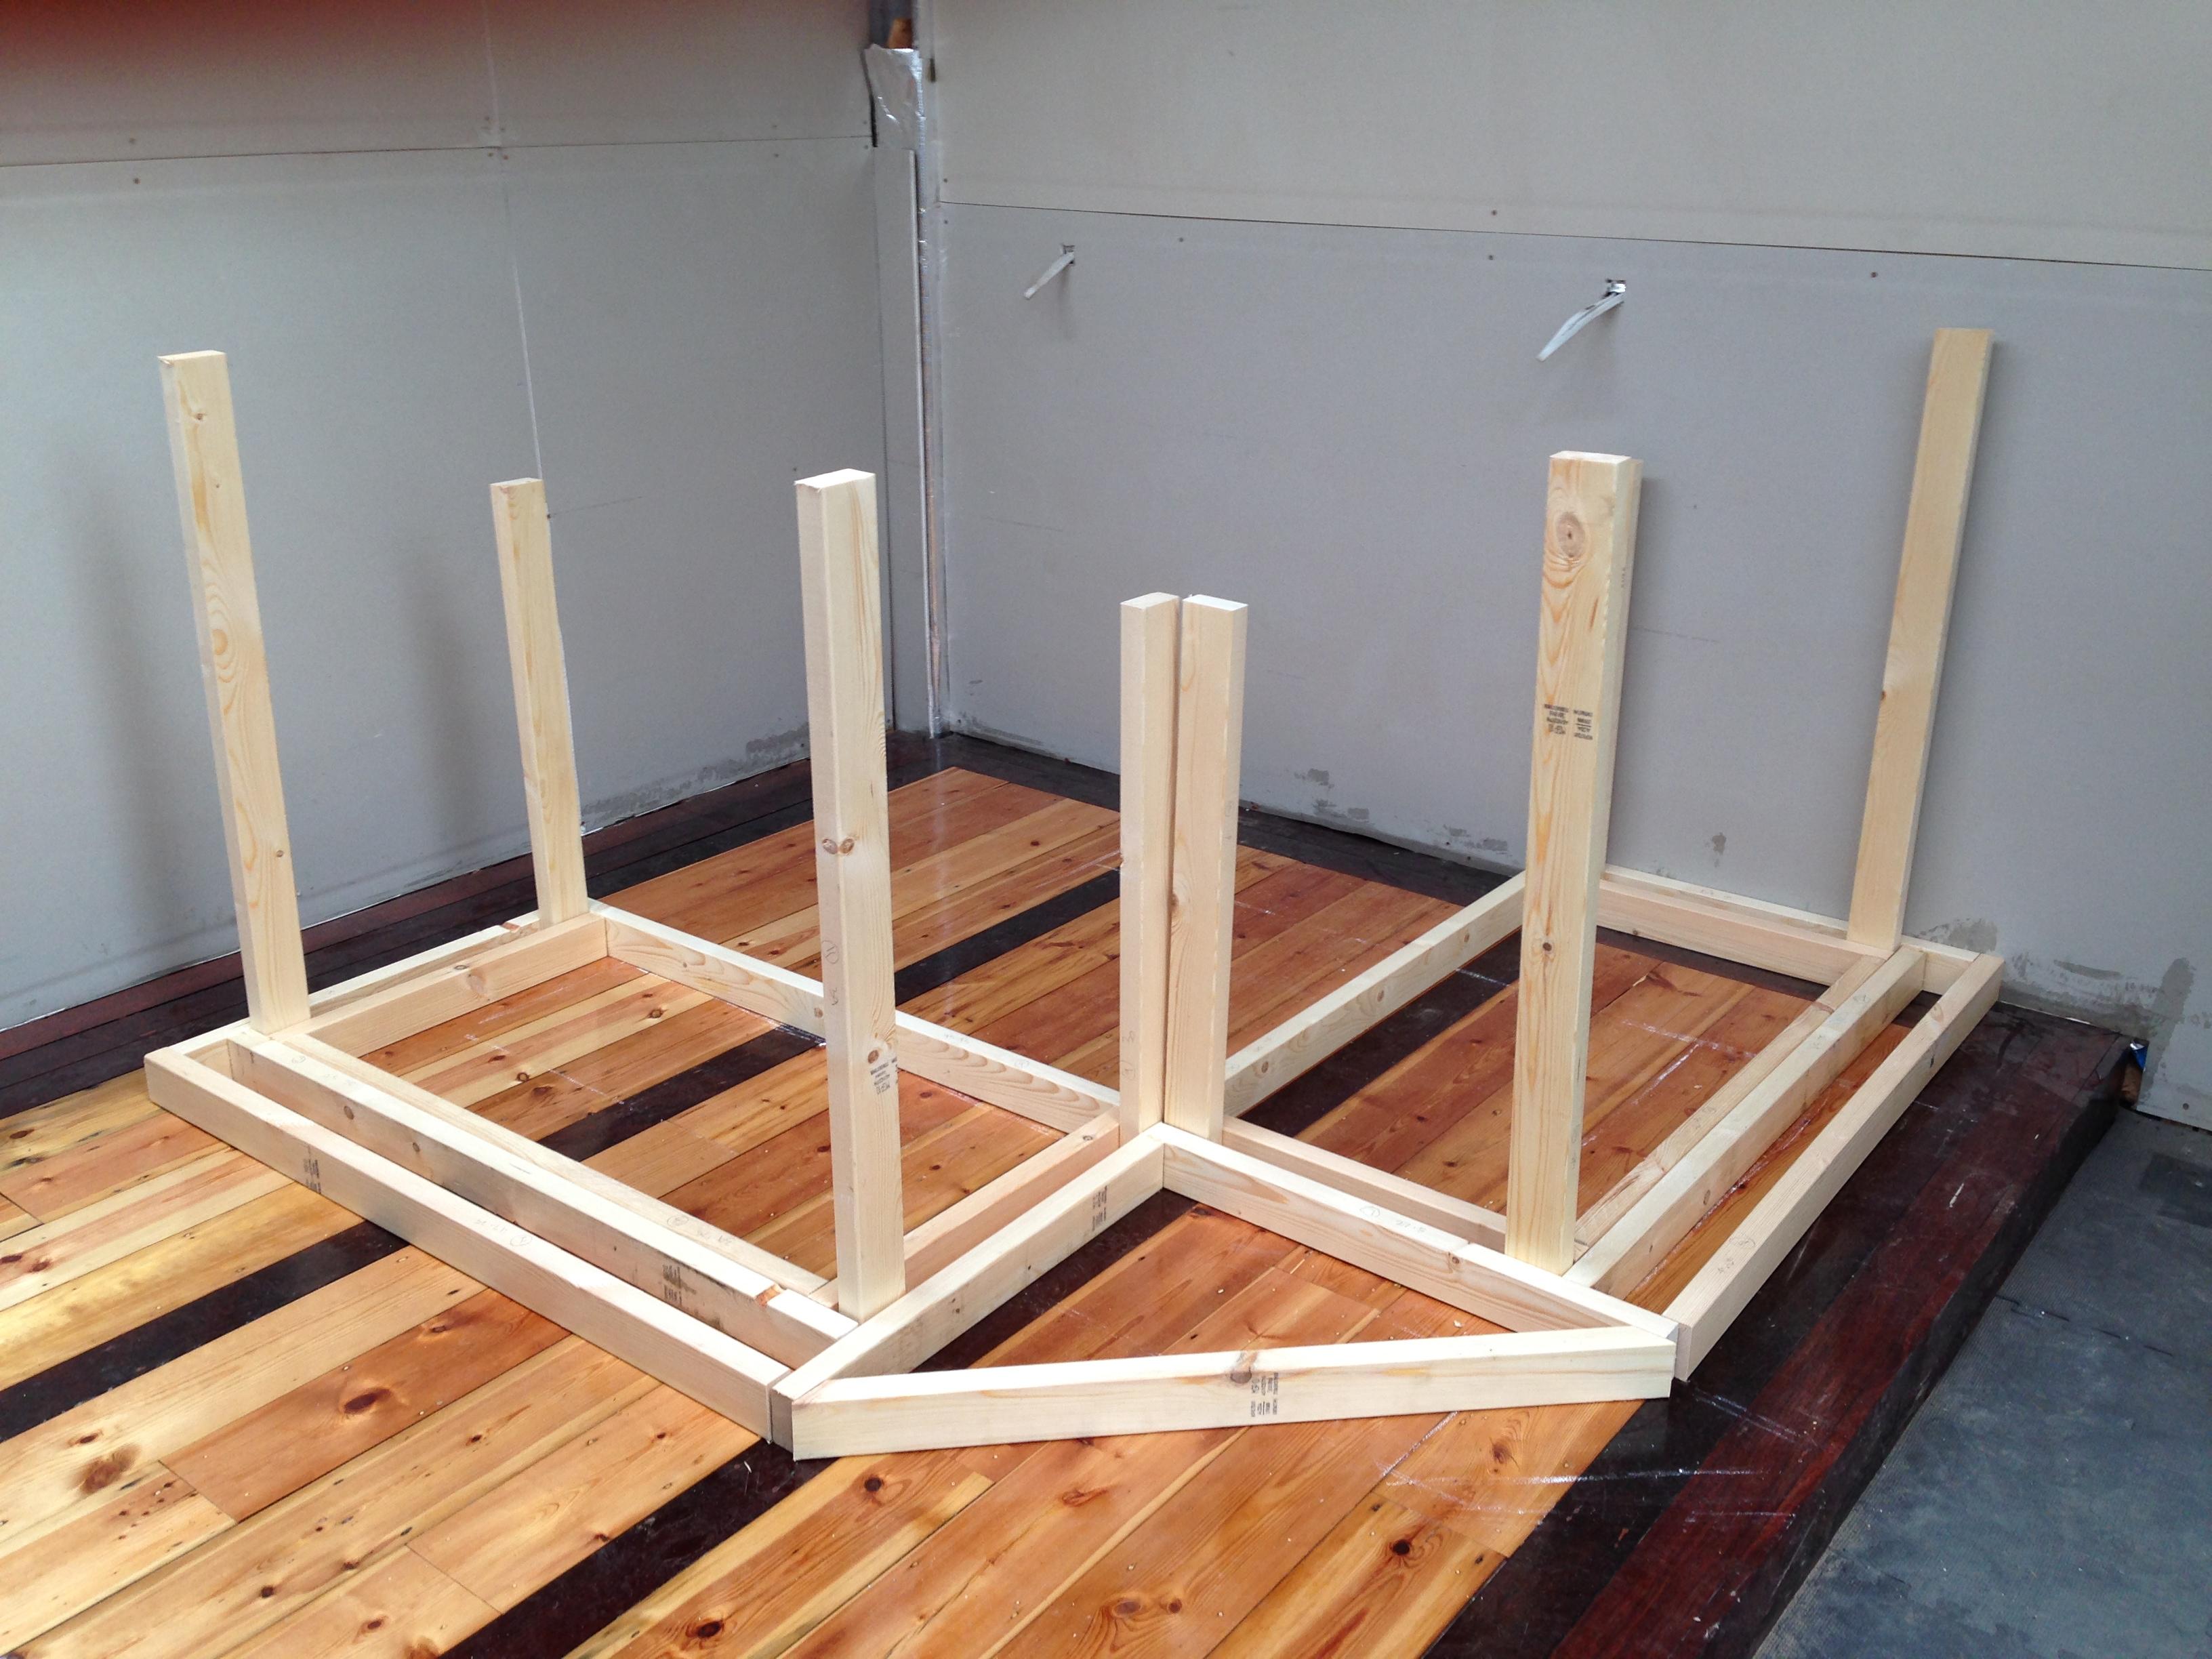 Bar build finally begins ultimatemancavebuild for How to build a home bar easy